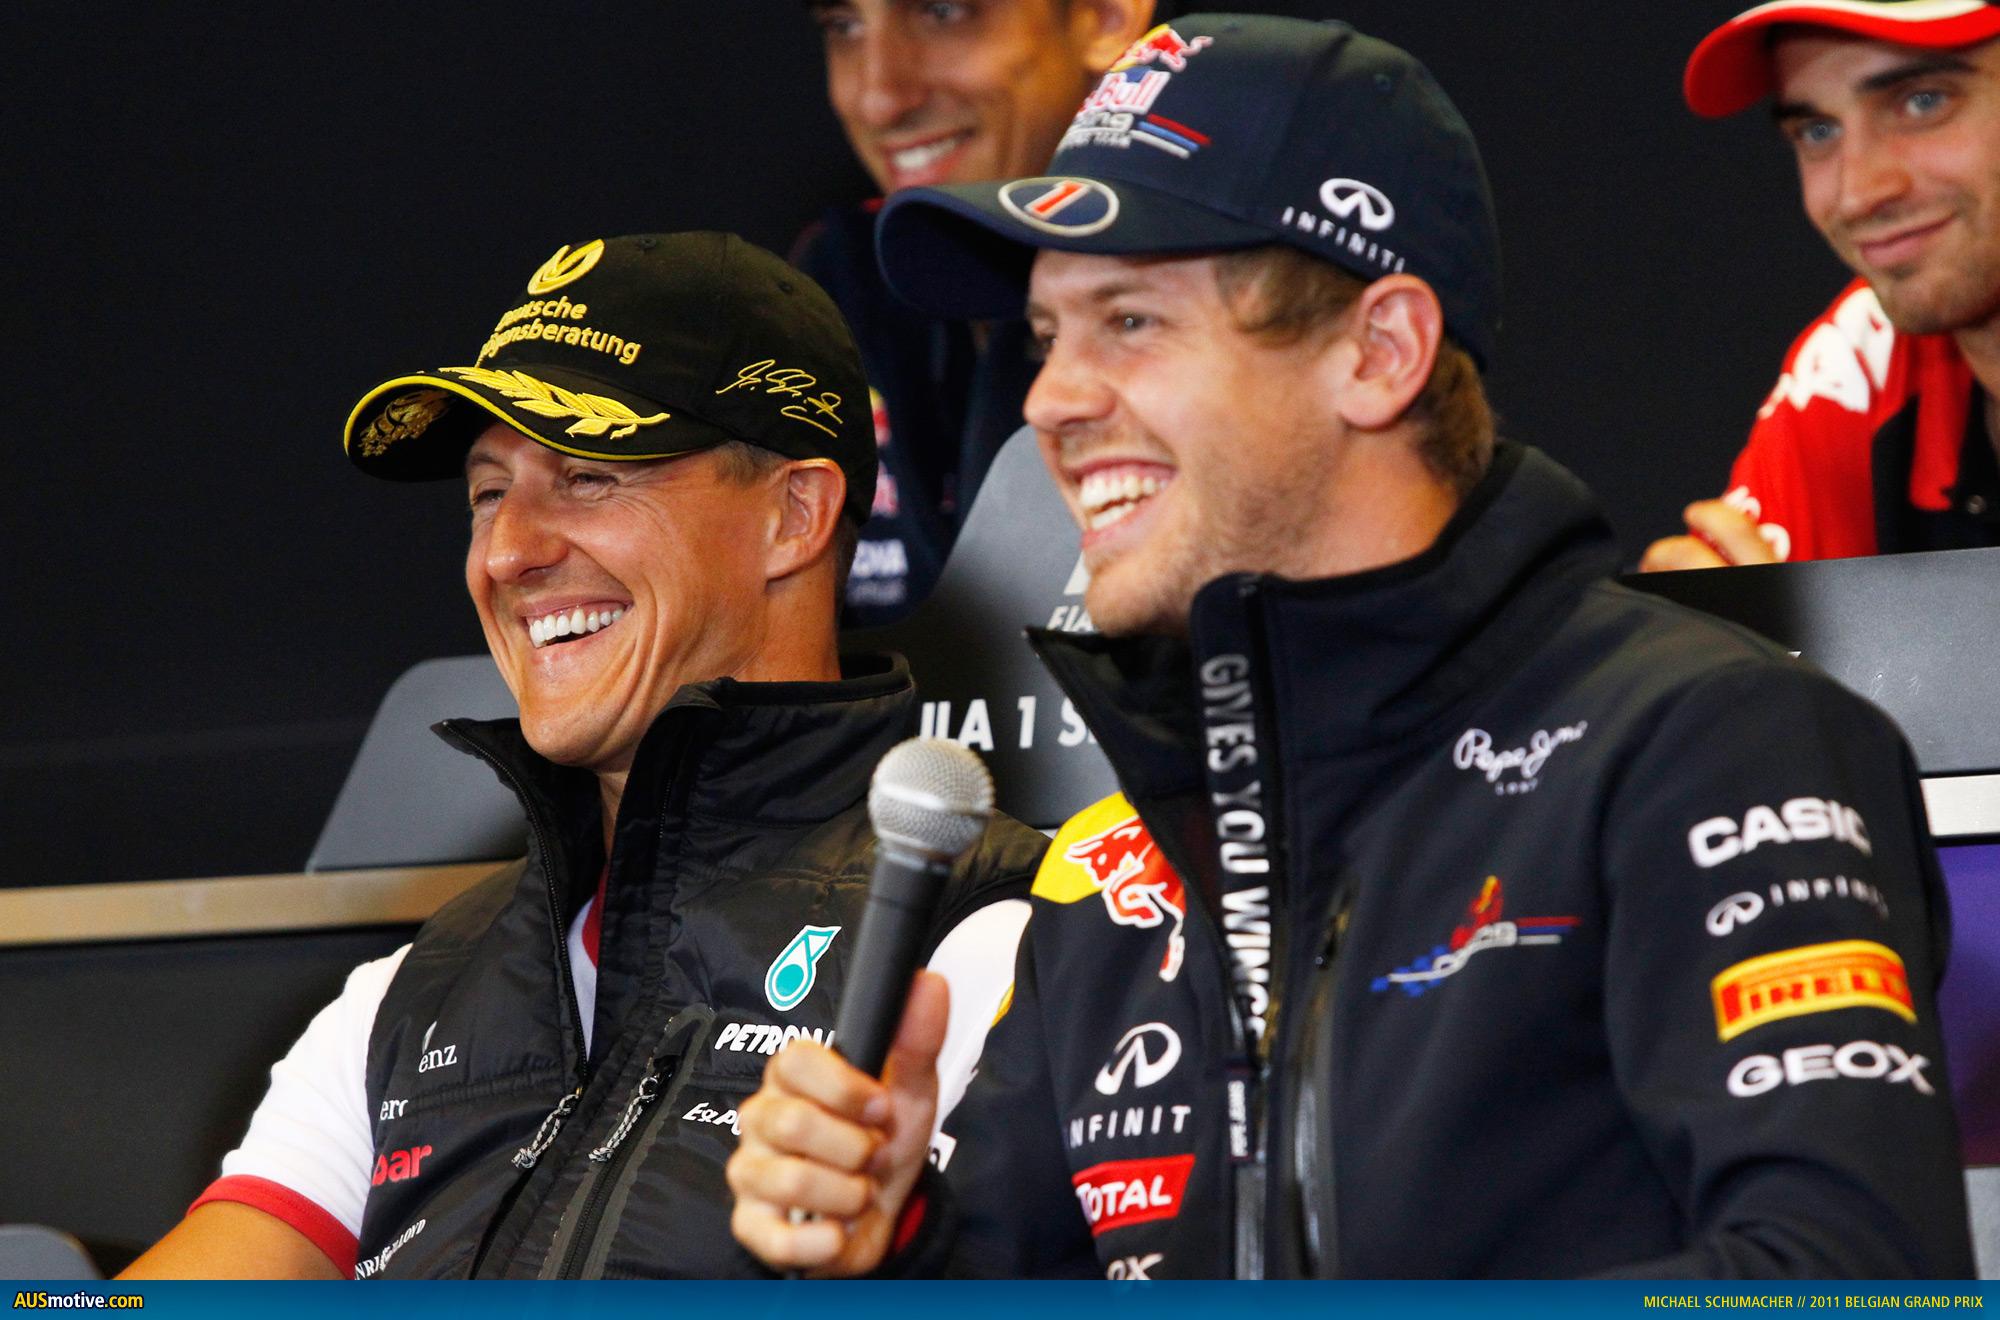 Belgian Grand Prix Circuit >> AUSmotive.com » Michael Schumacher on 20 years in F1